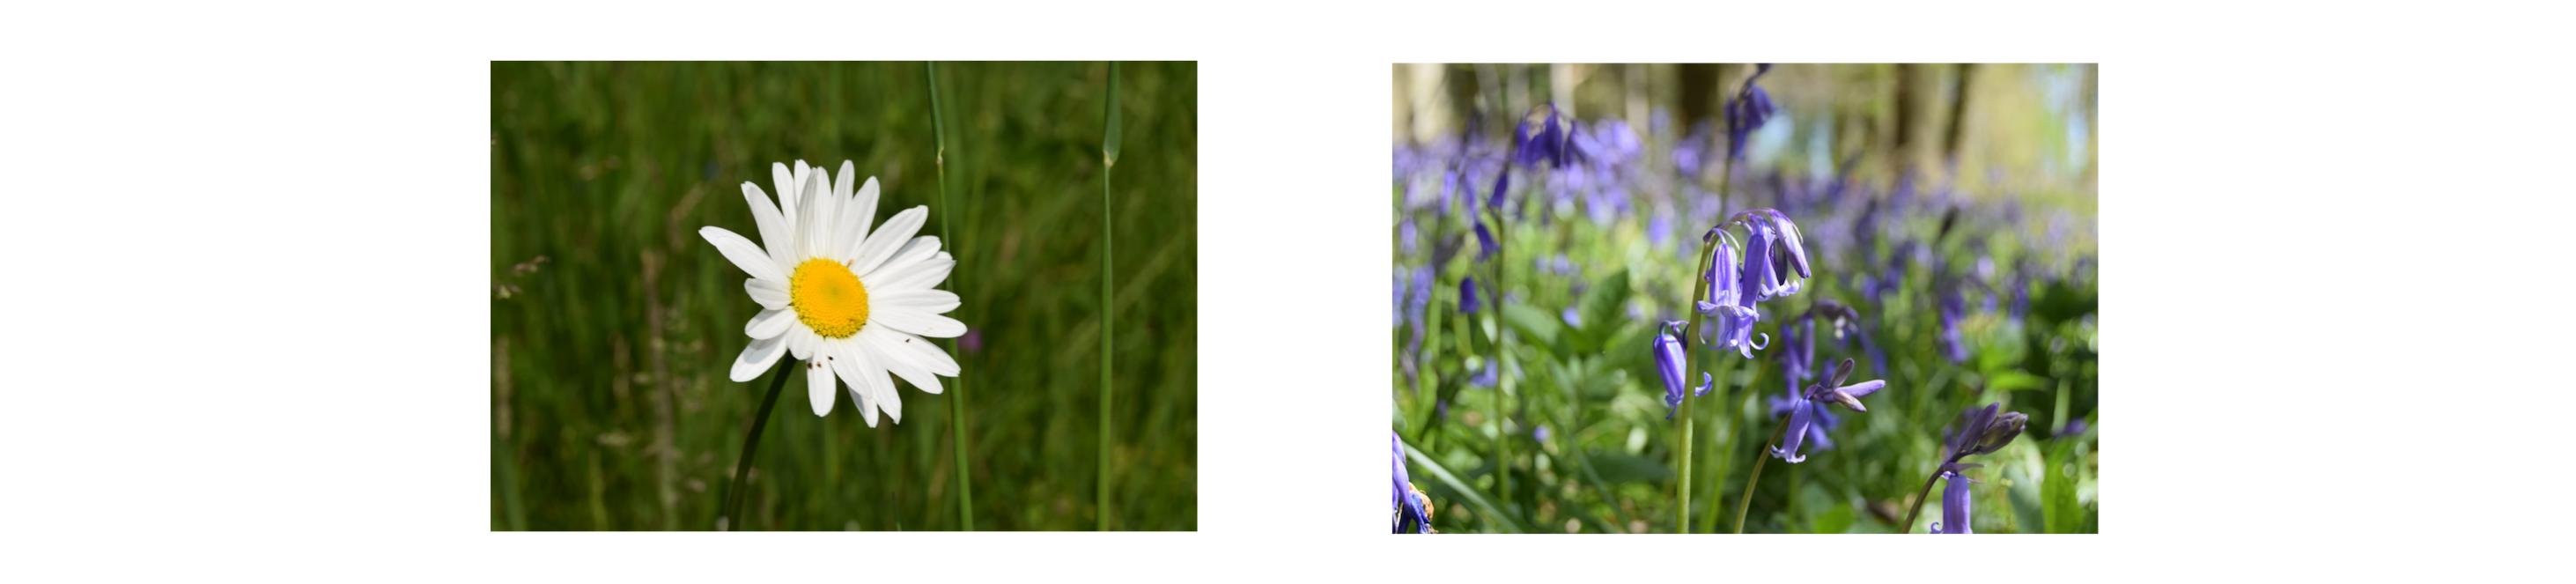 daisy bluebell banner